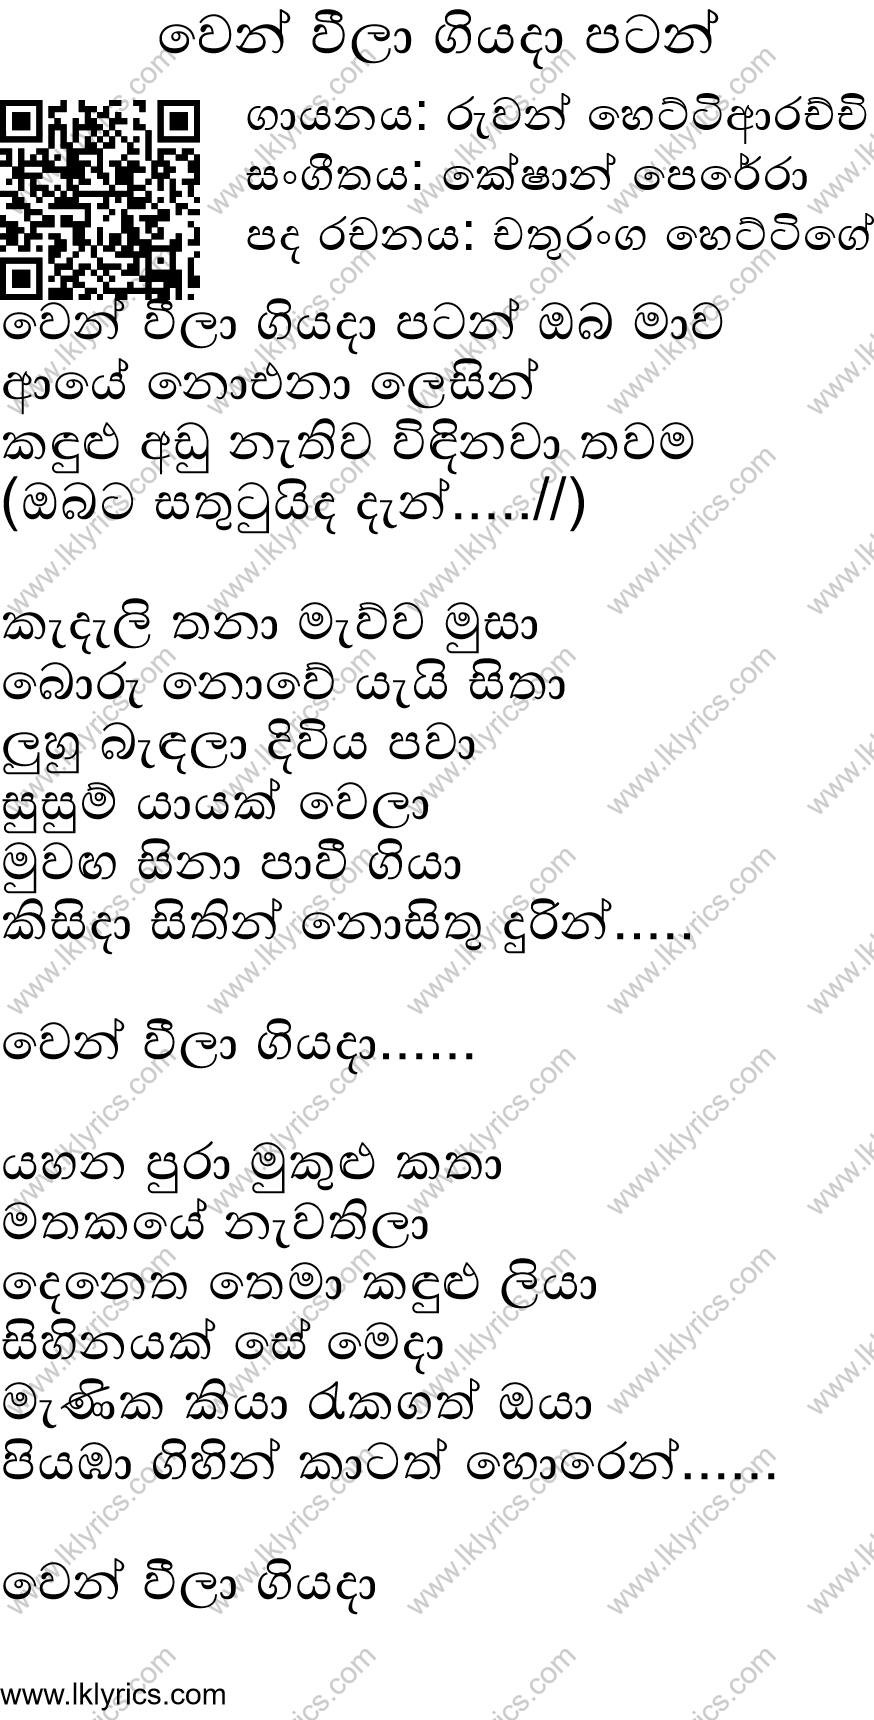 Wen Weela Giyada Patan Lyrics - LK Lyrics